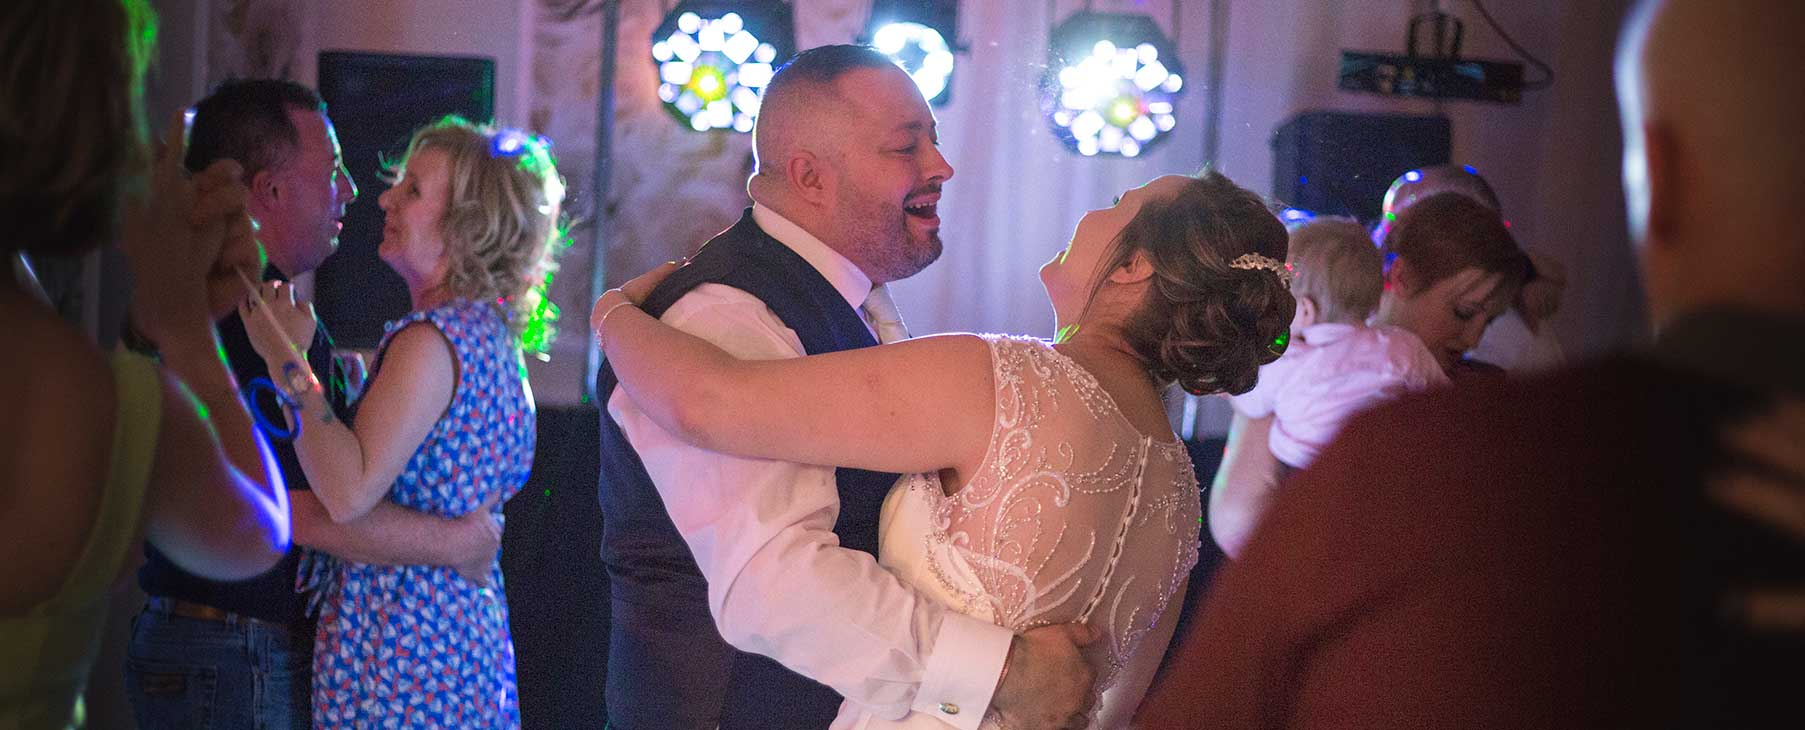 hull wedding dj disco east Yorkshire hire entertainment